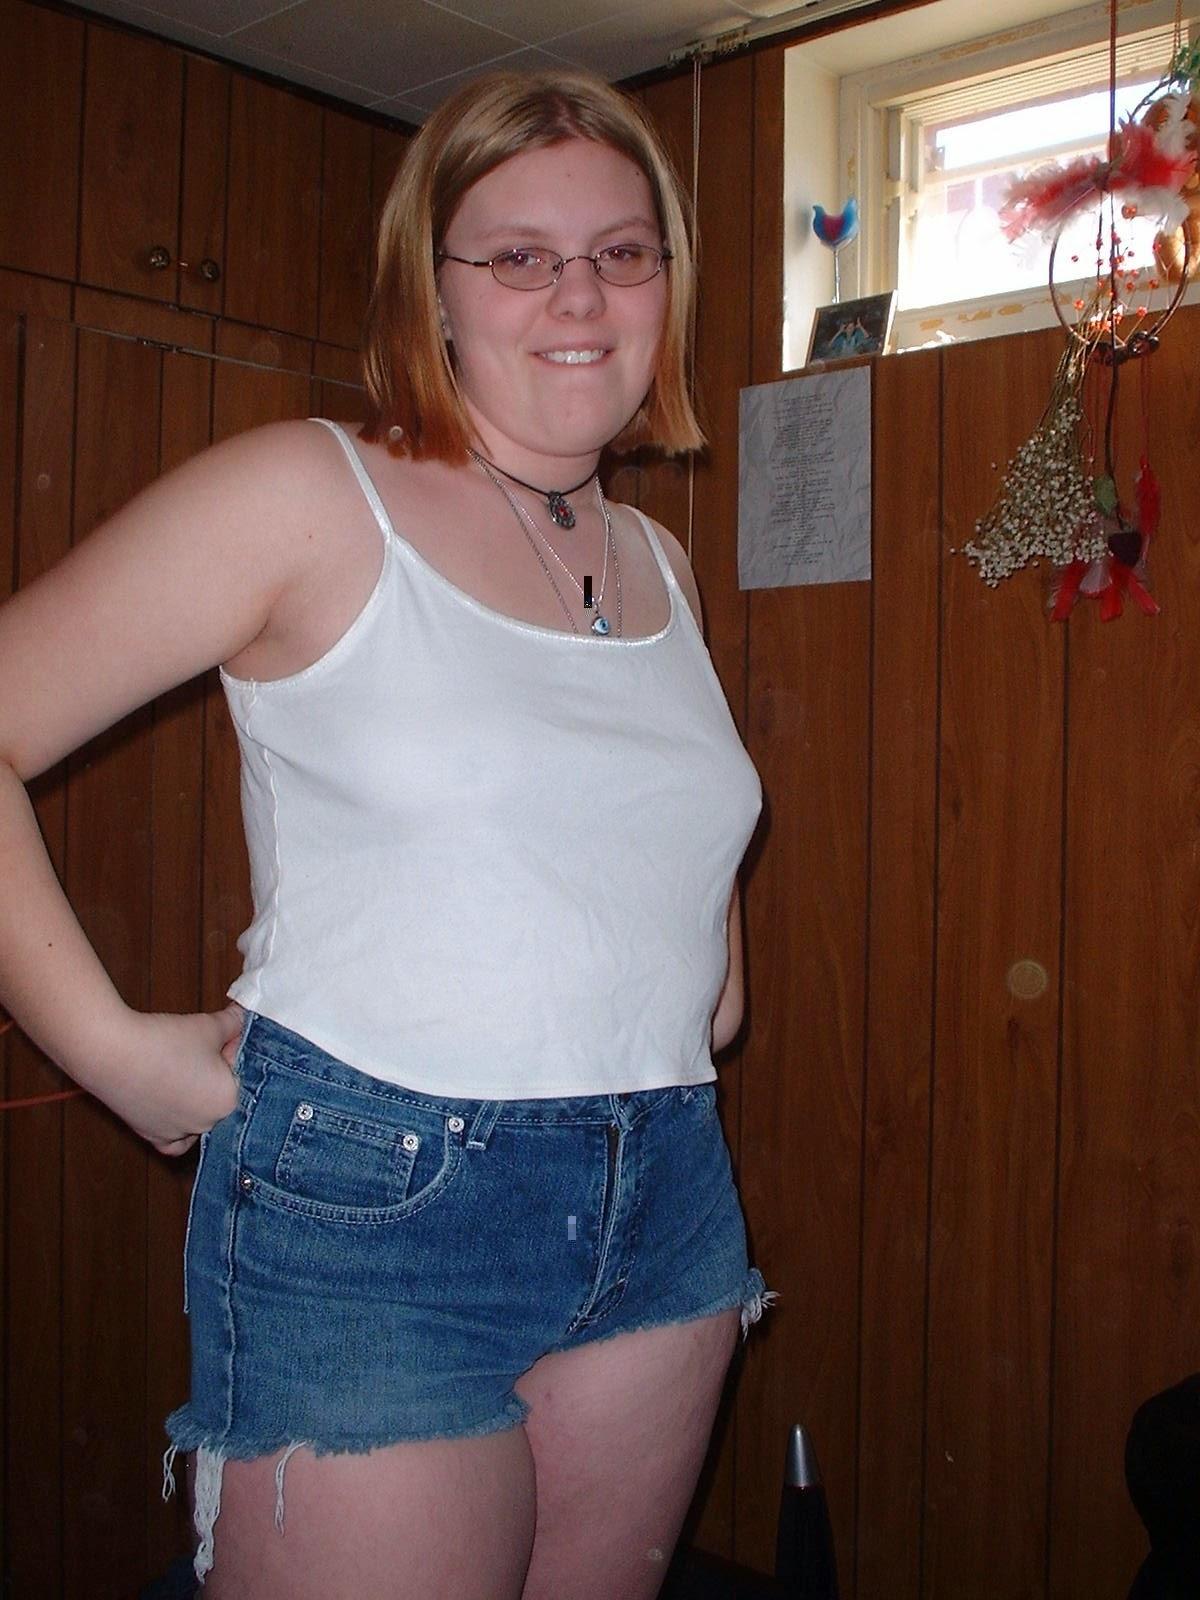 Chubby Teen Blonde Interracial